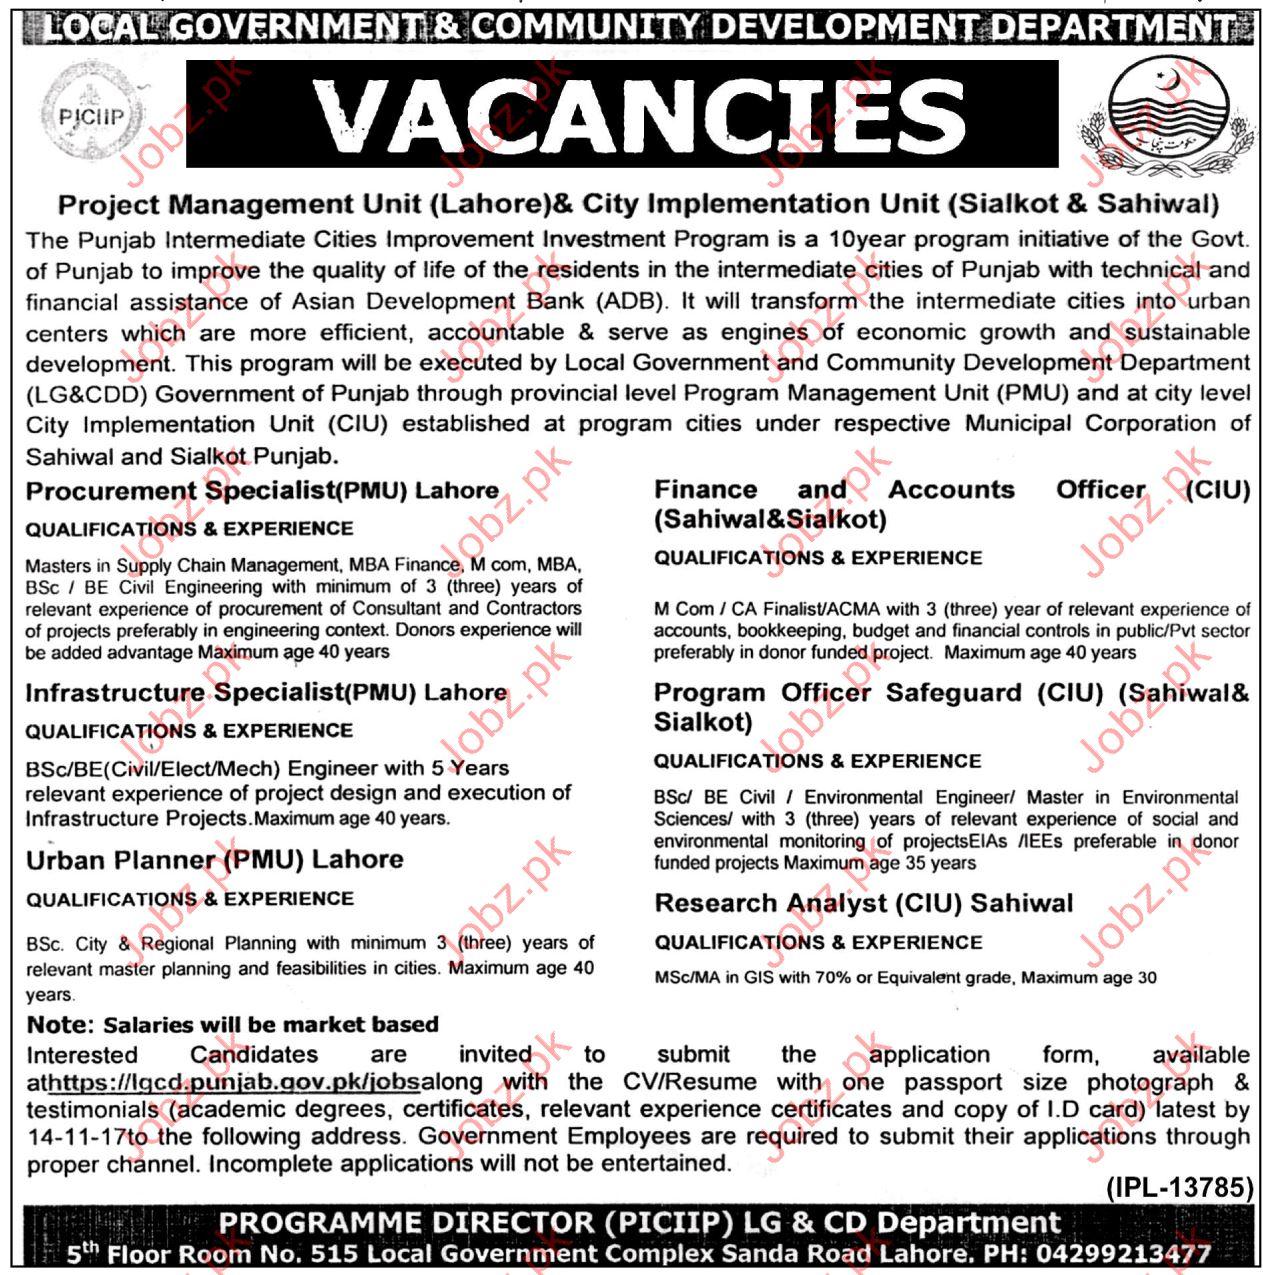 LGCD Jobs Local Govt & Community Development Department